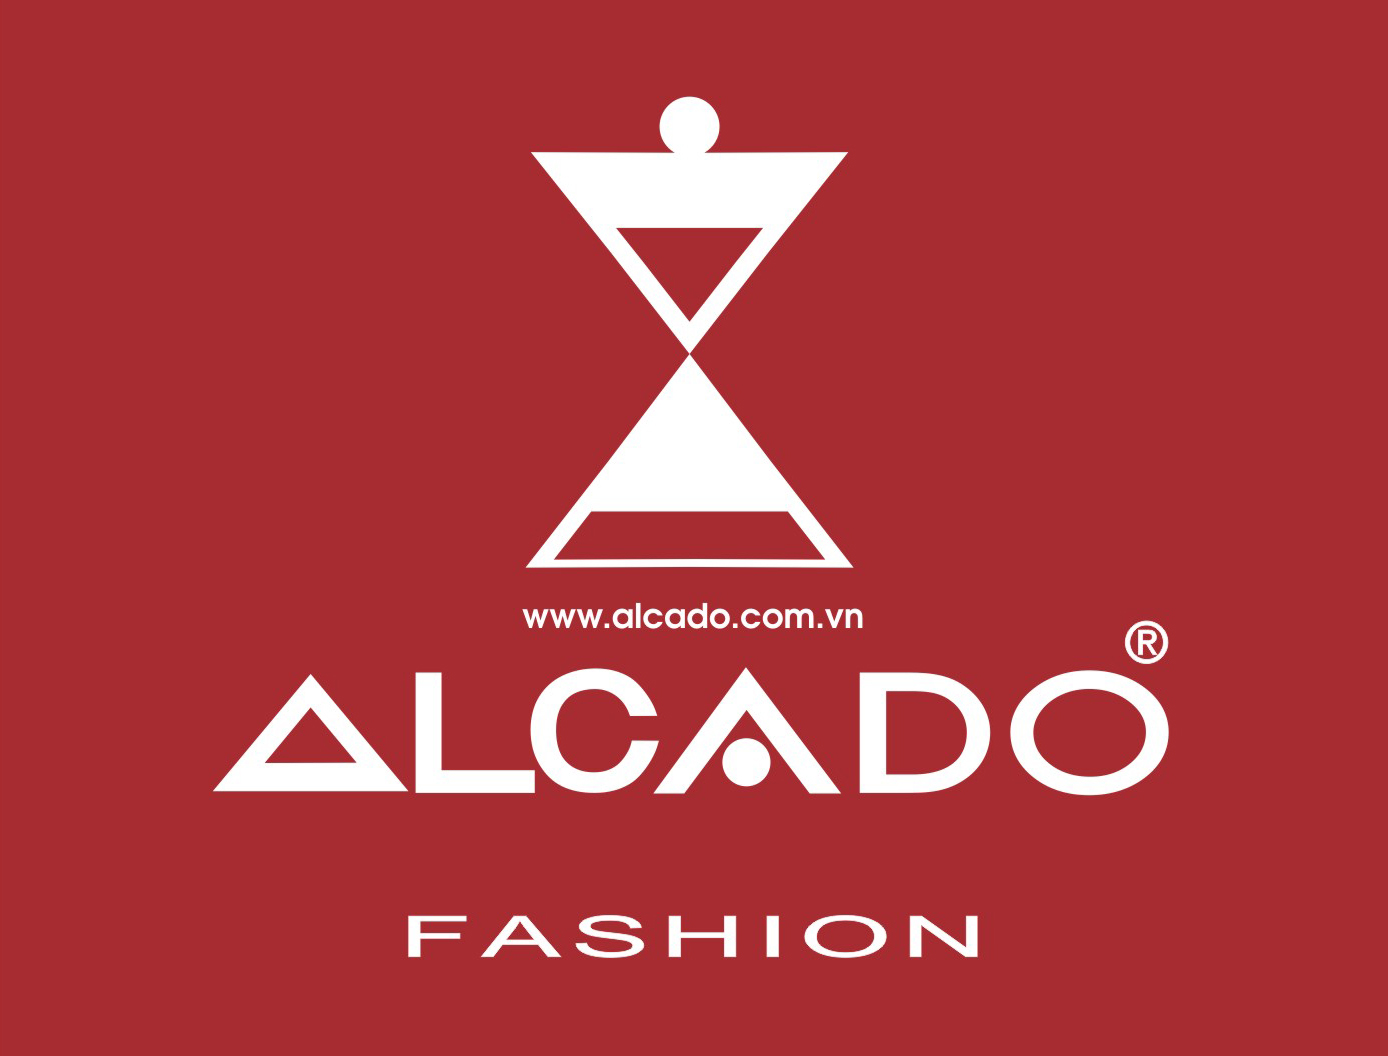 2065309678_logo alcadochuan_crop trang.jpg